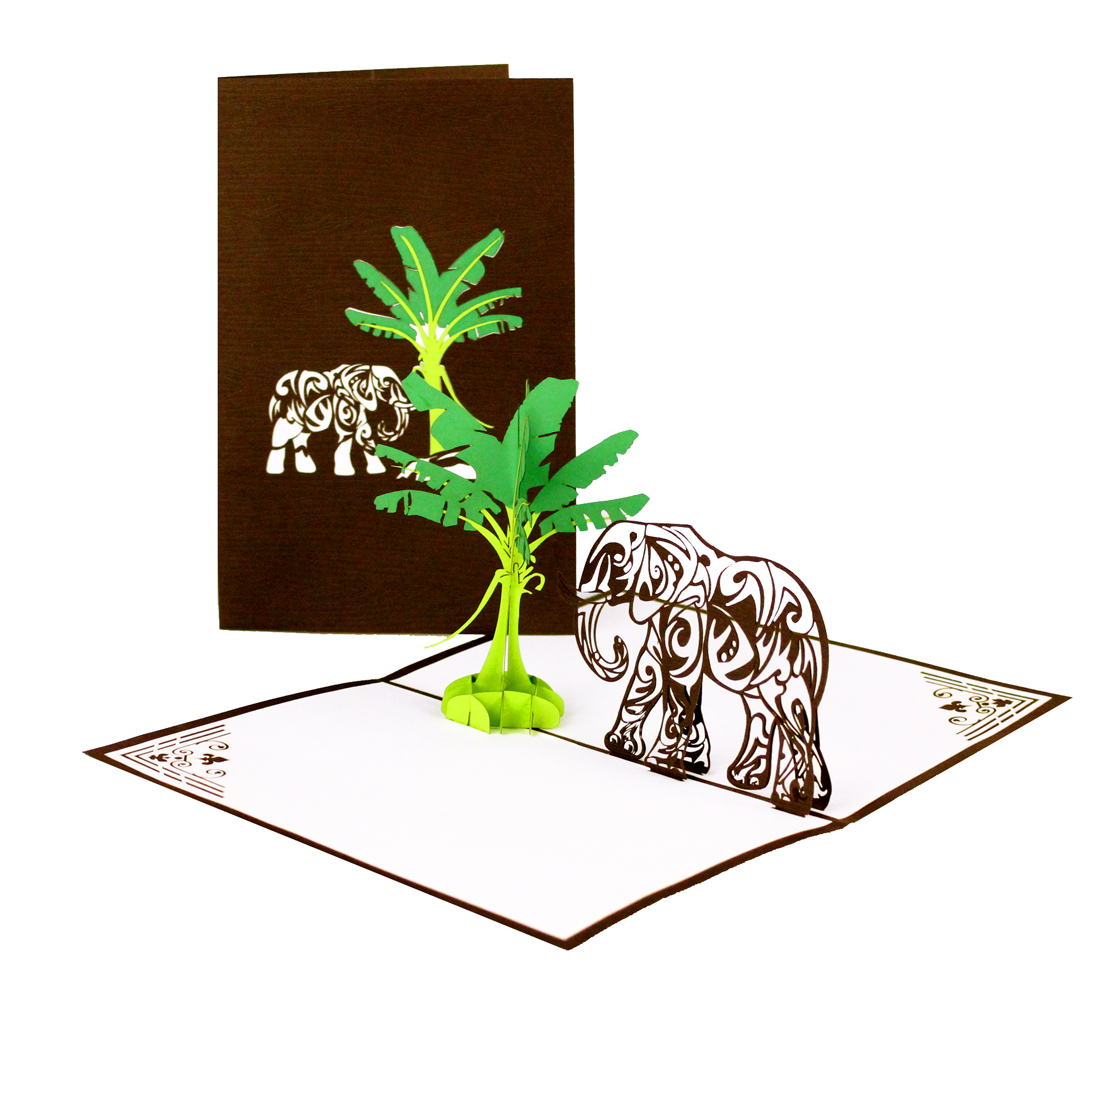 Elefant & Bananenbaum